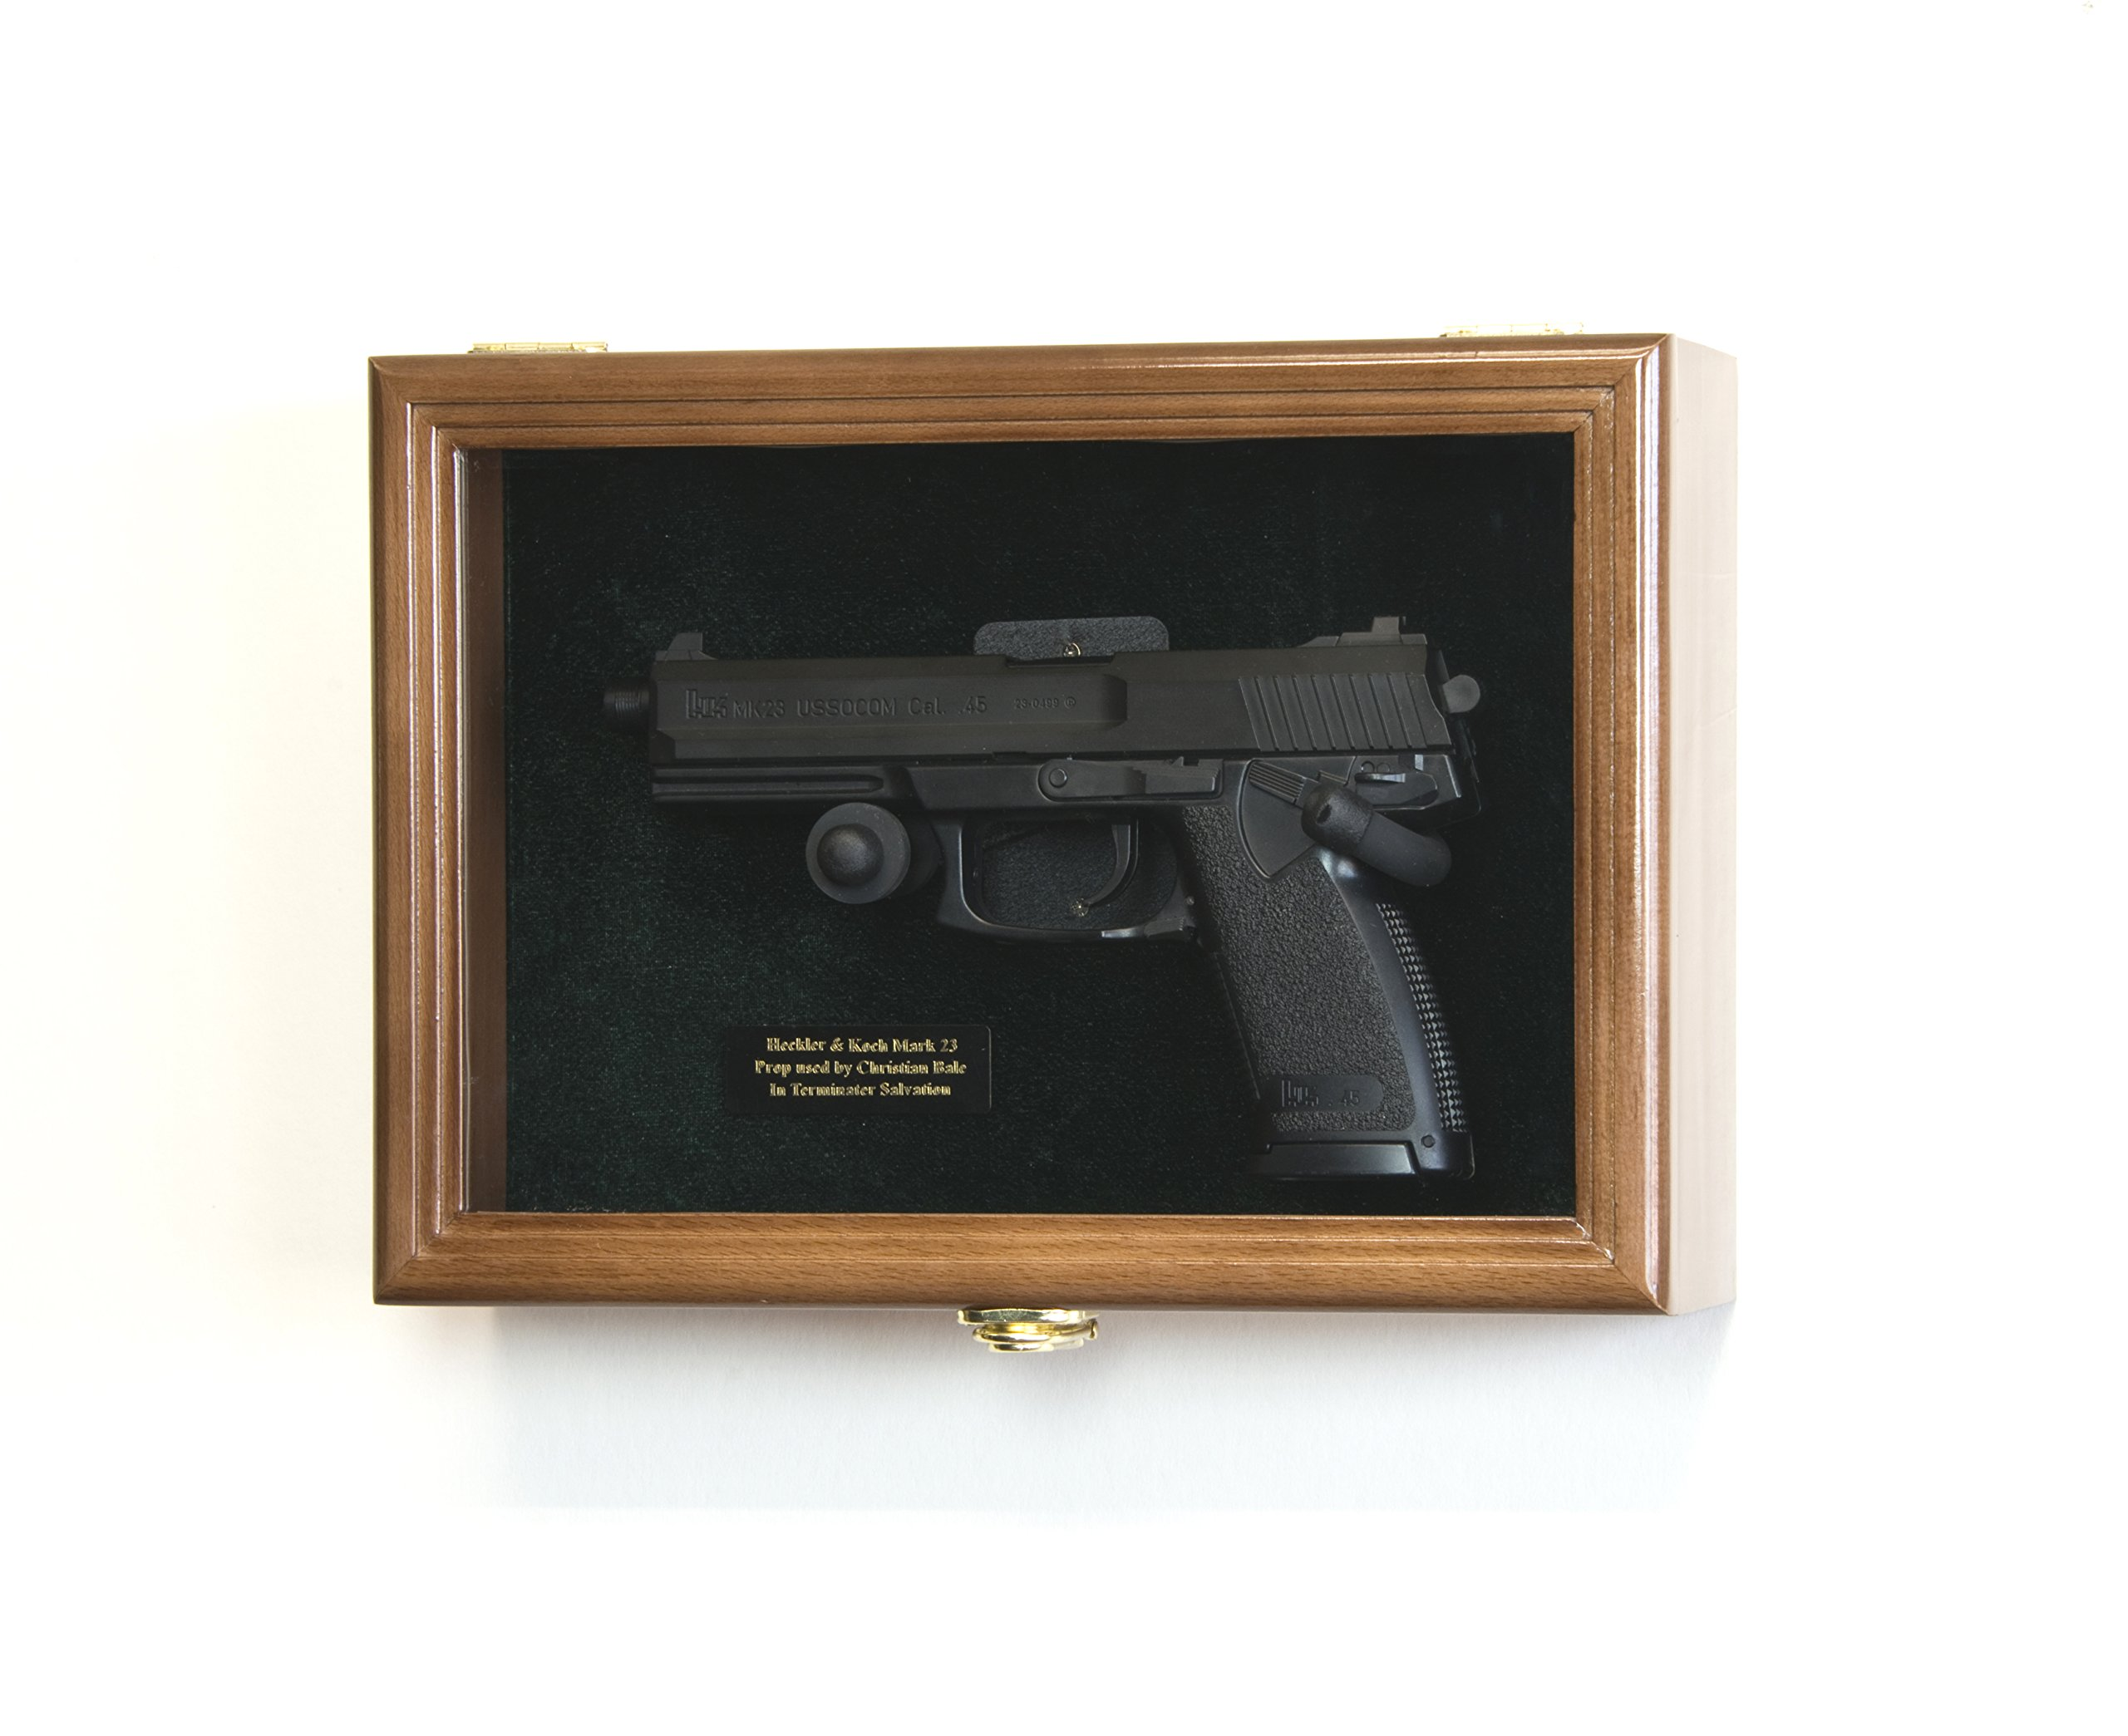 Single Pistol Display Case Wall Mount Solid Hardwood Cabinet (Walnut Finish, Green Felt Background) by sfDisplay.com, Factory Direct Display Cases